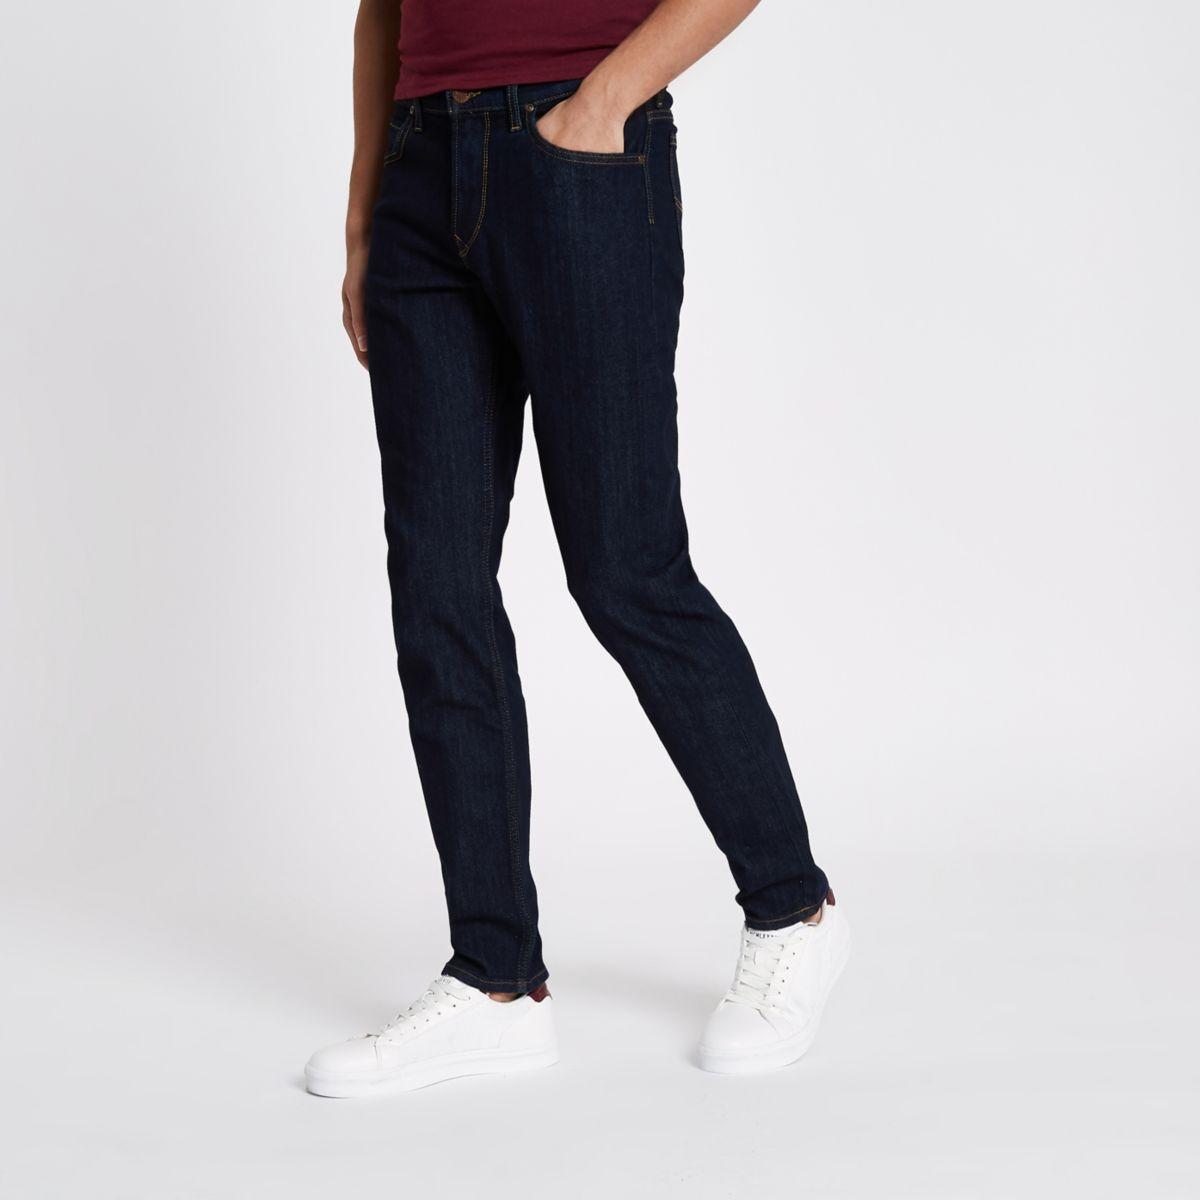 Lee dark blue slim fit Rider jeans